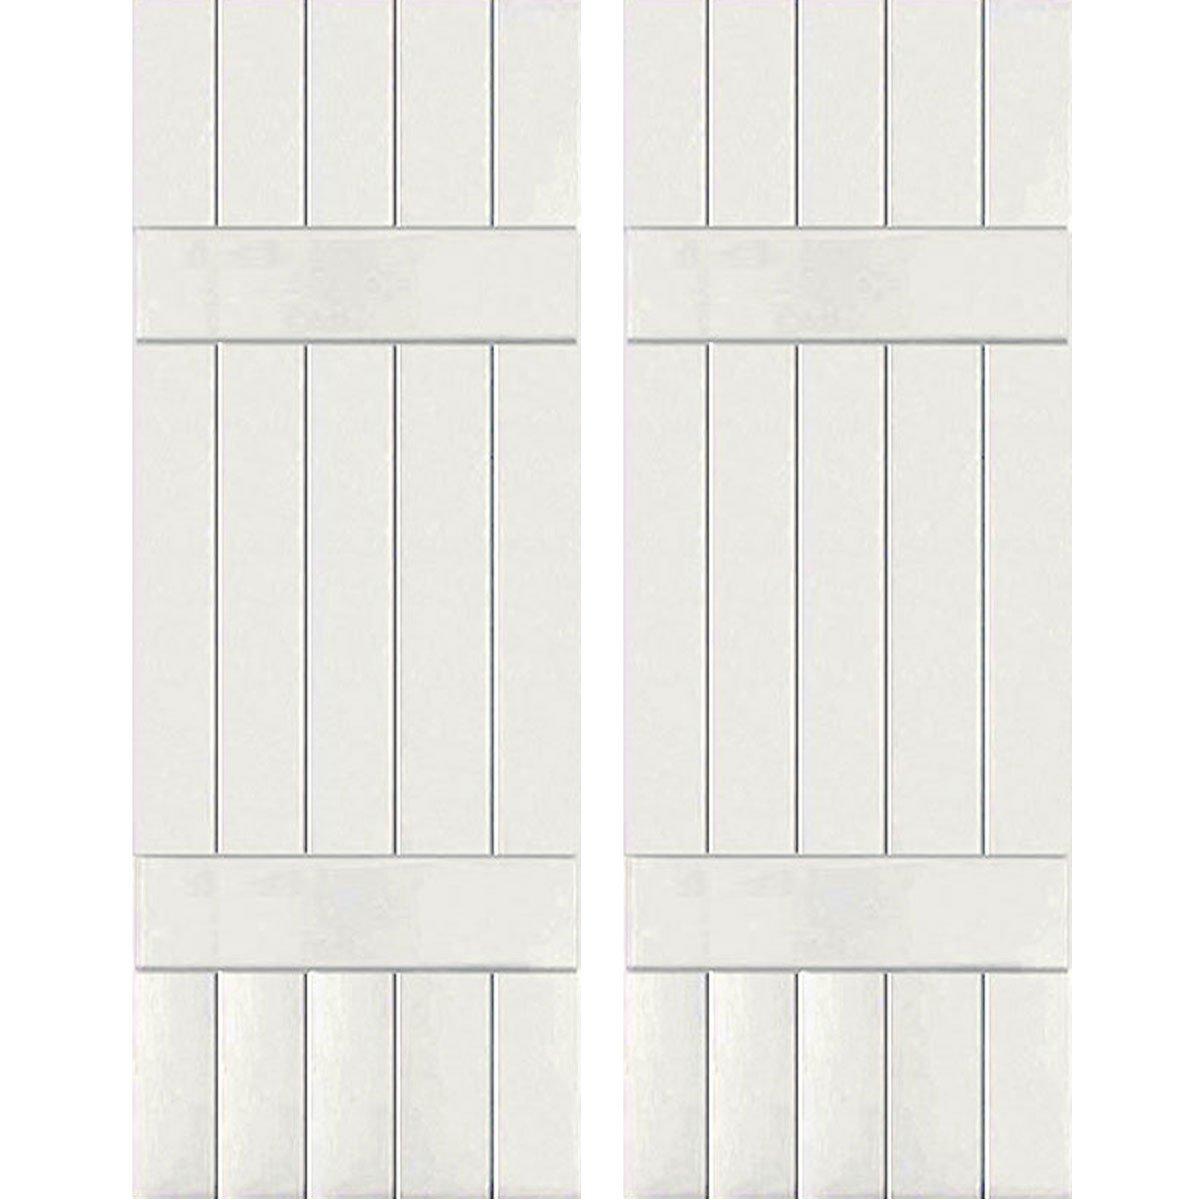 Ekena Millwork CWB18X043WHC Exterior Five Board